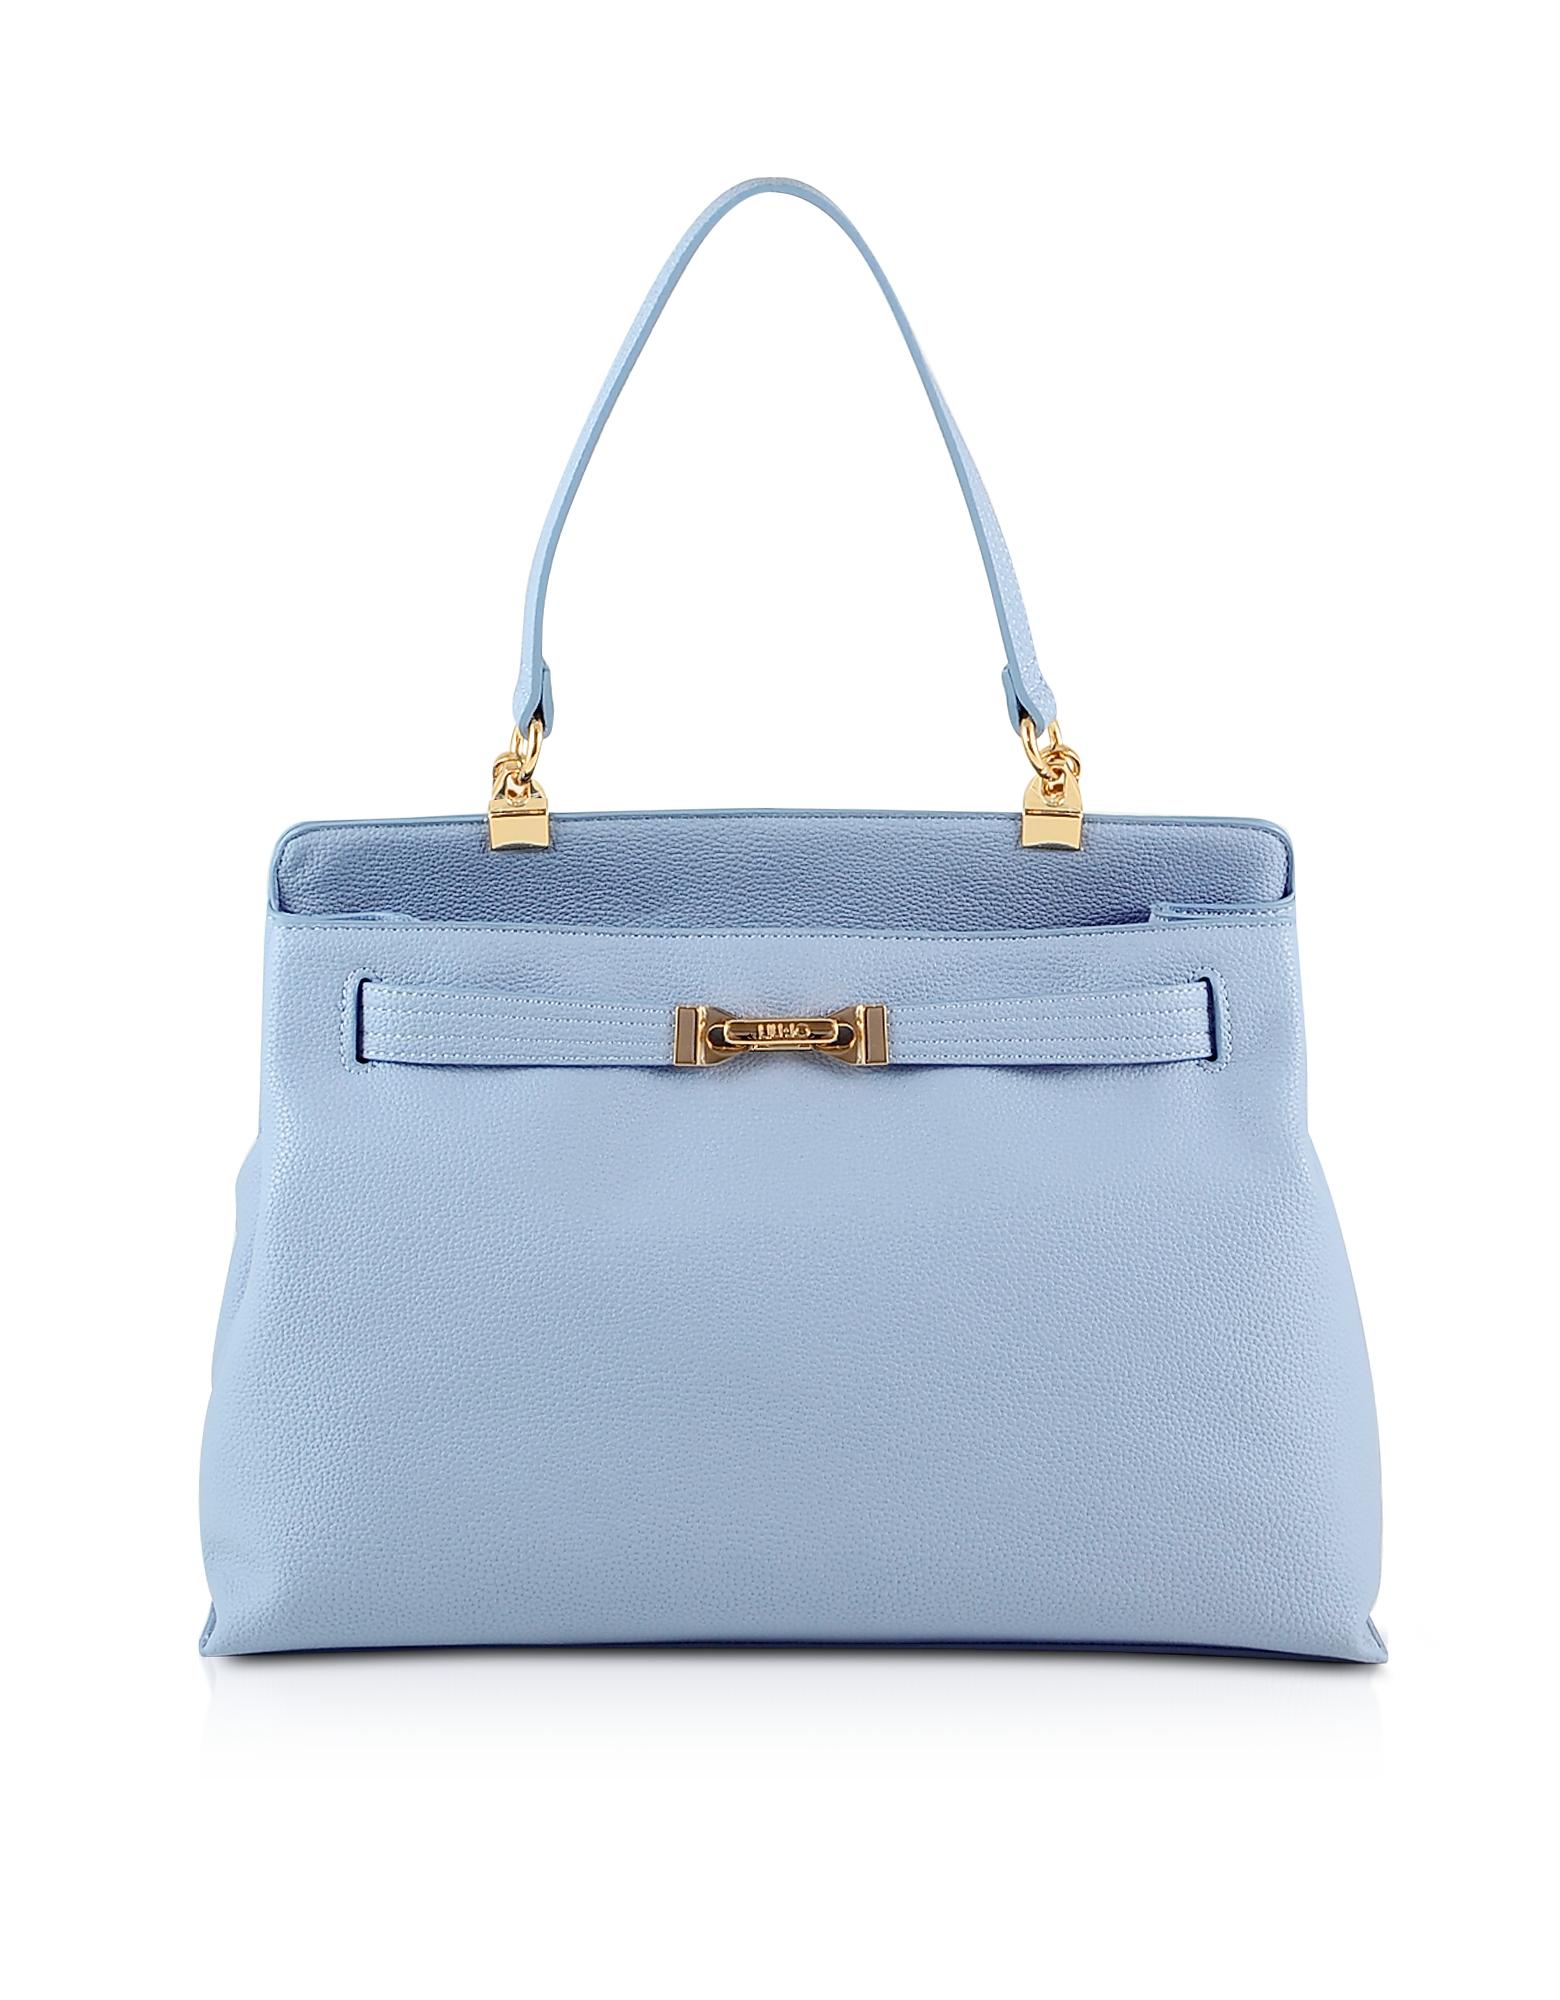 Liu Jo Designer Handbags, Light Blue Top Handle Tote